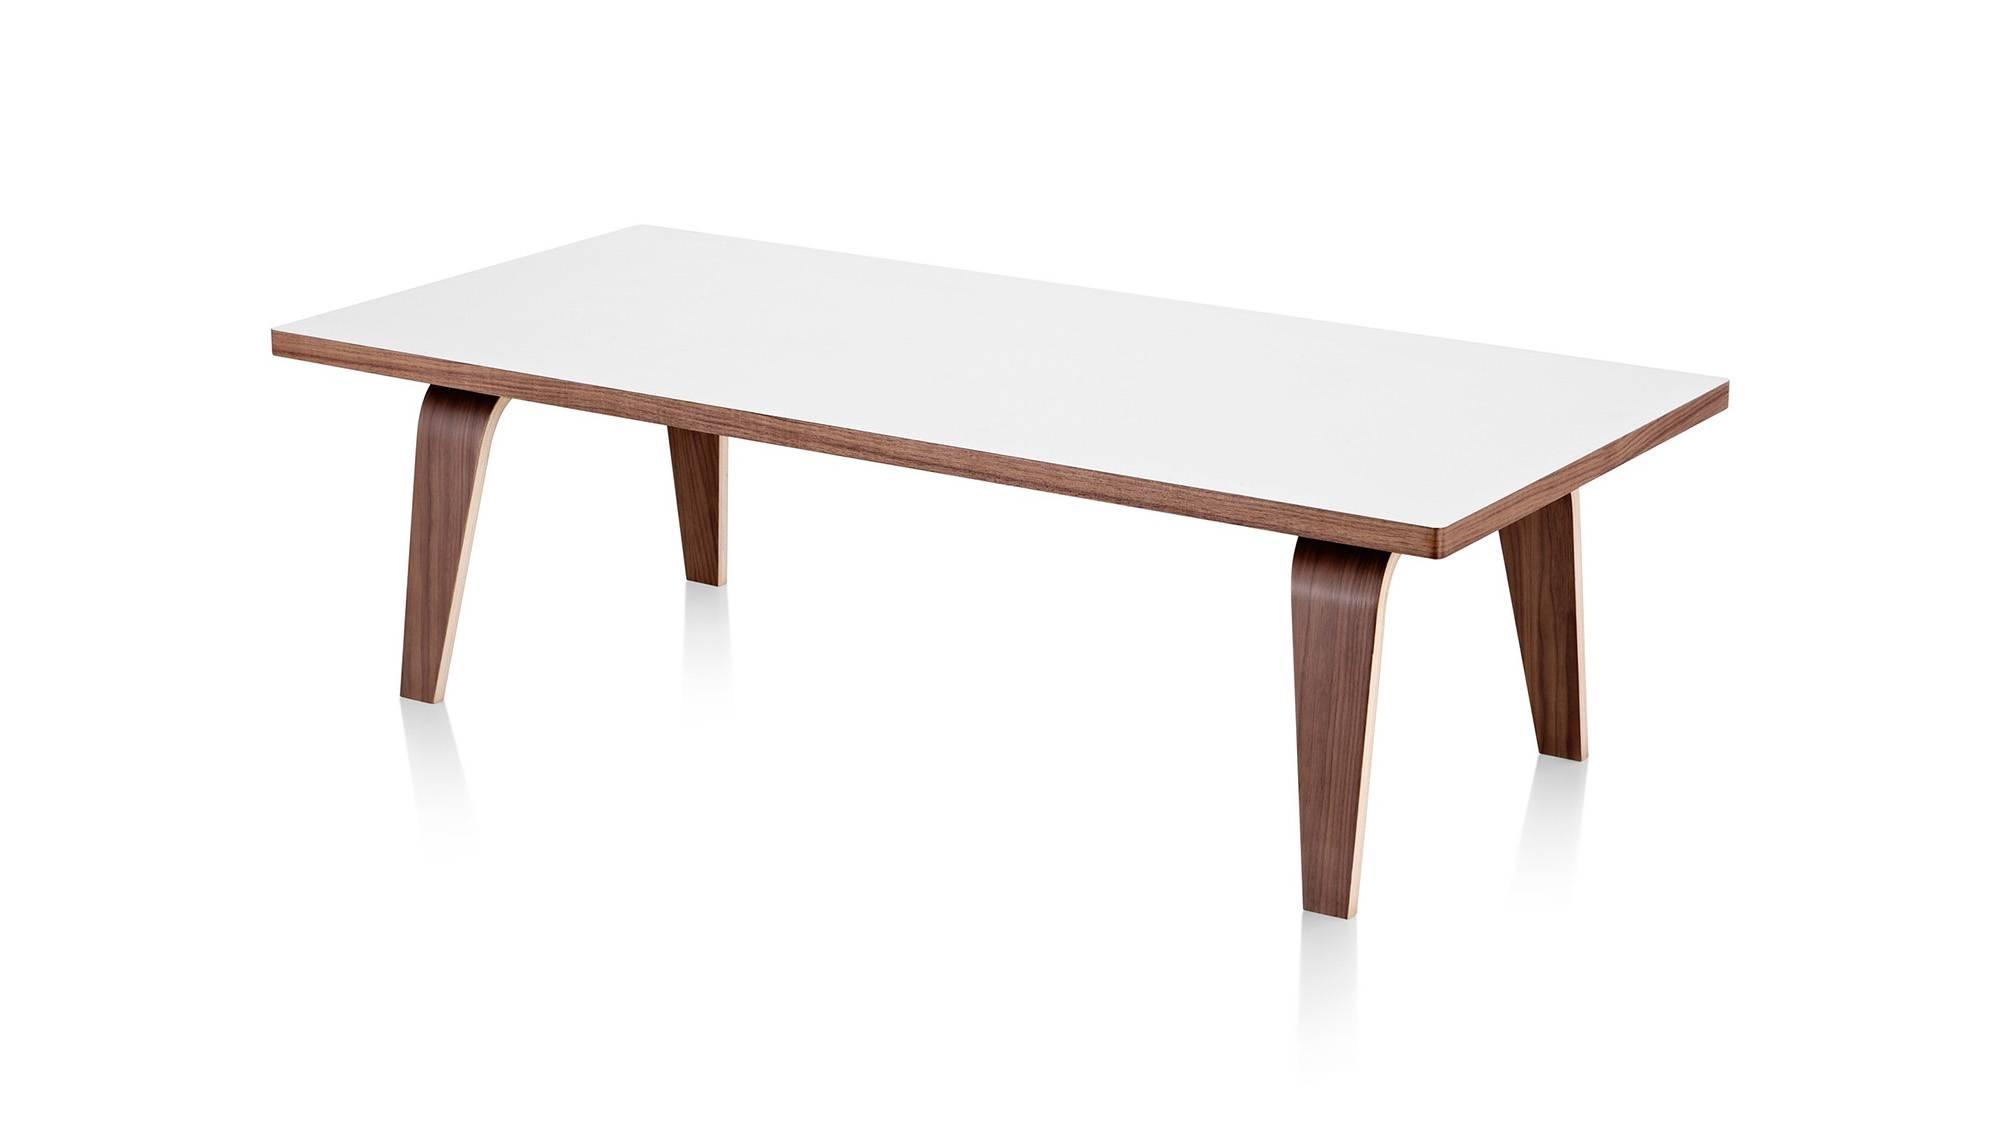 Eames Rectangular Coffee Table - Herman Miller inside Rectangular Coffee Tables (Image 7 of 15)